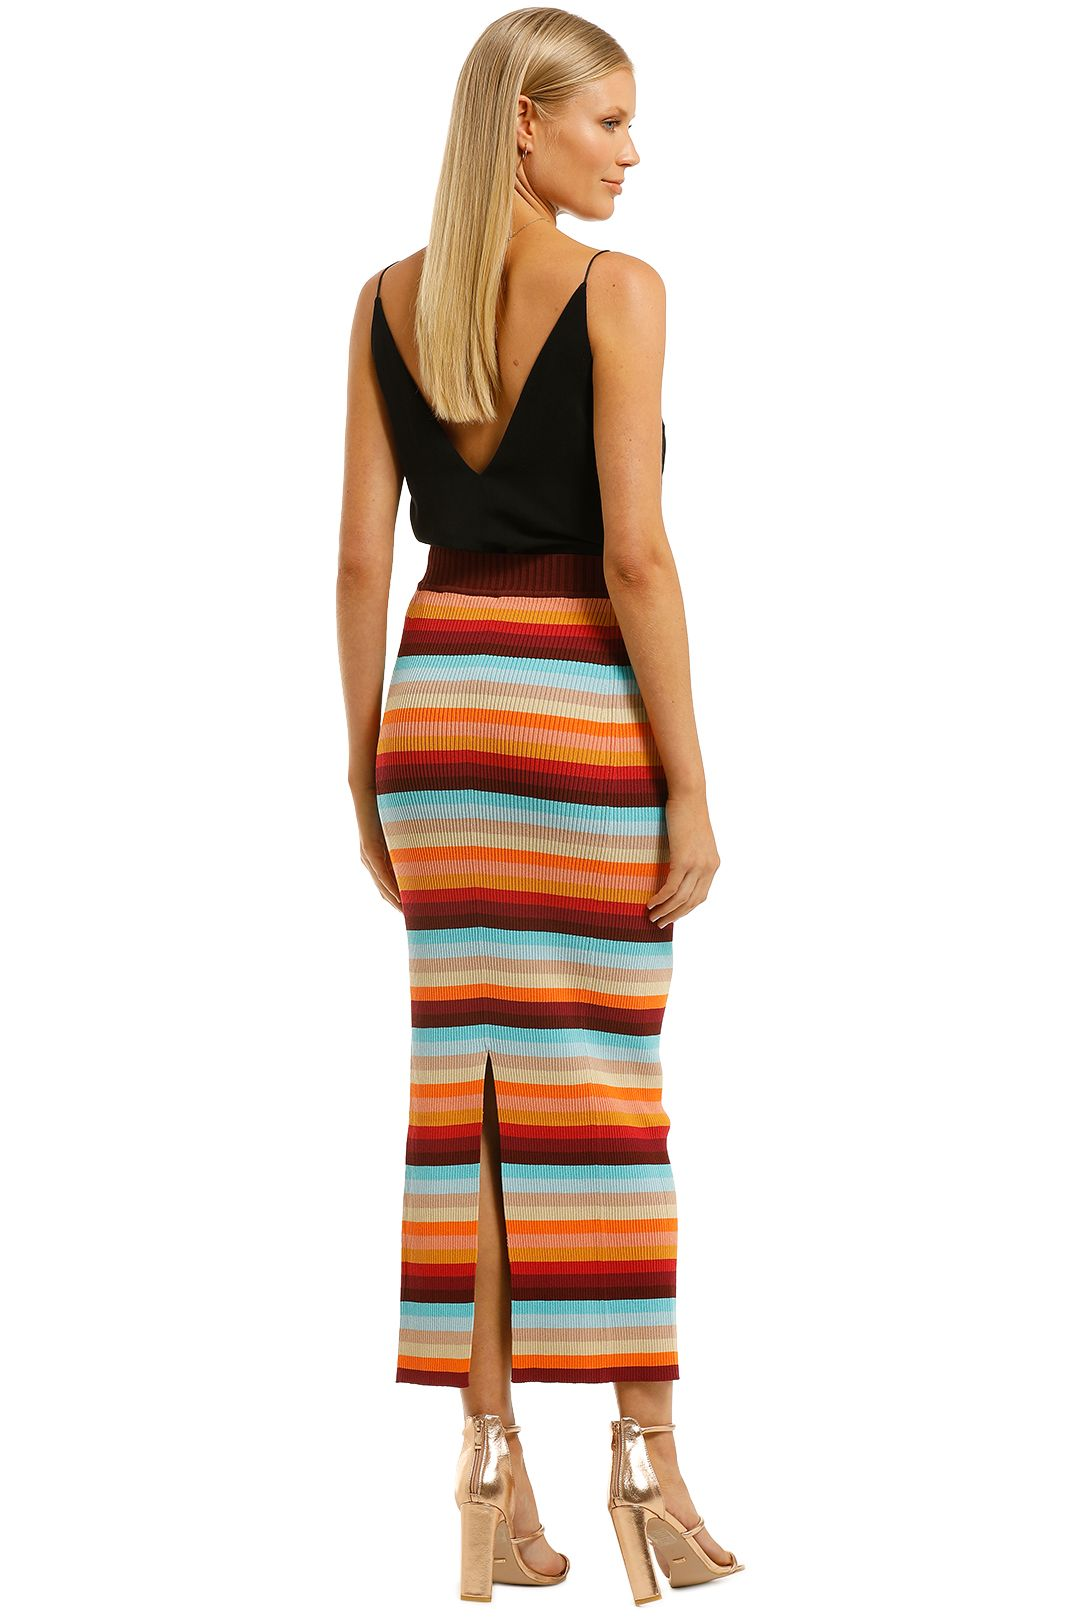 Scanlan-Theodore-Crepe-Knit-Stripe-Skirt-Sunset-Back